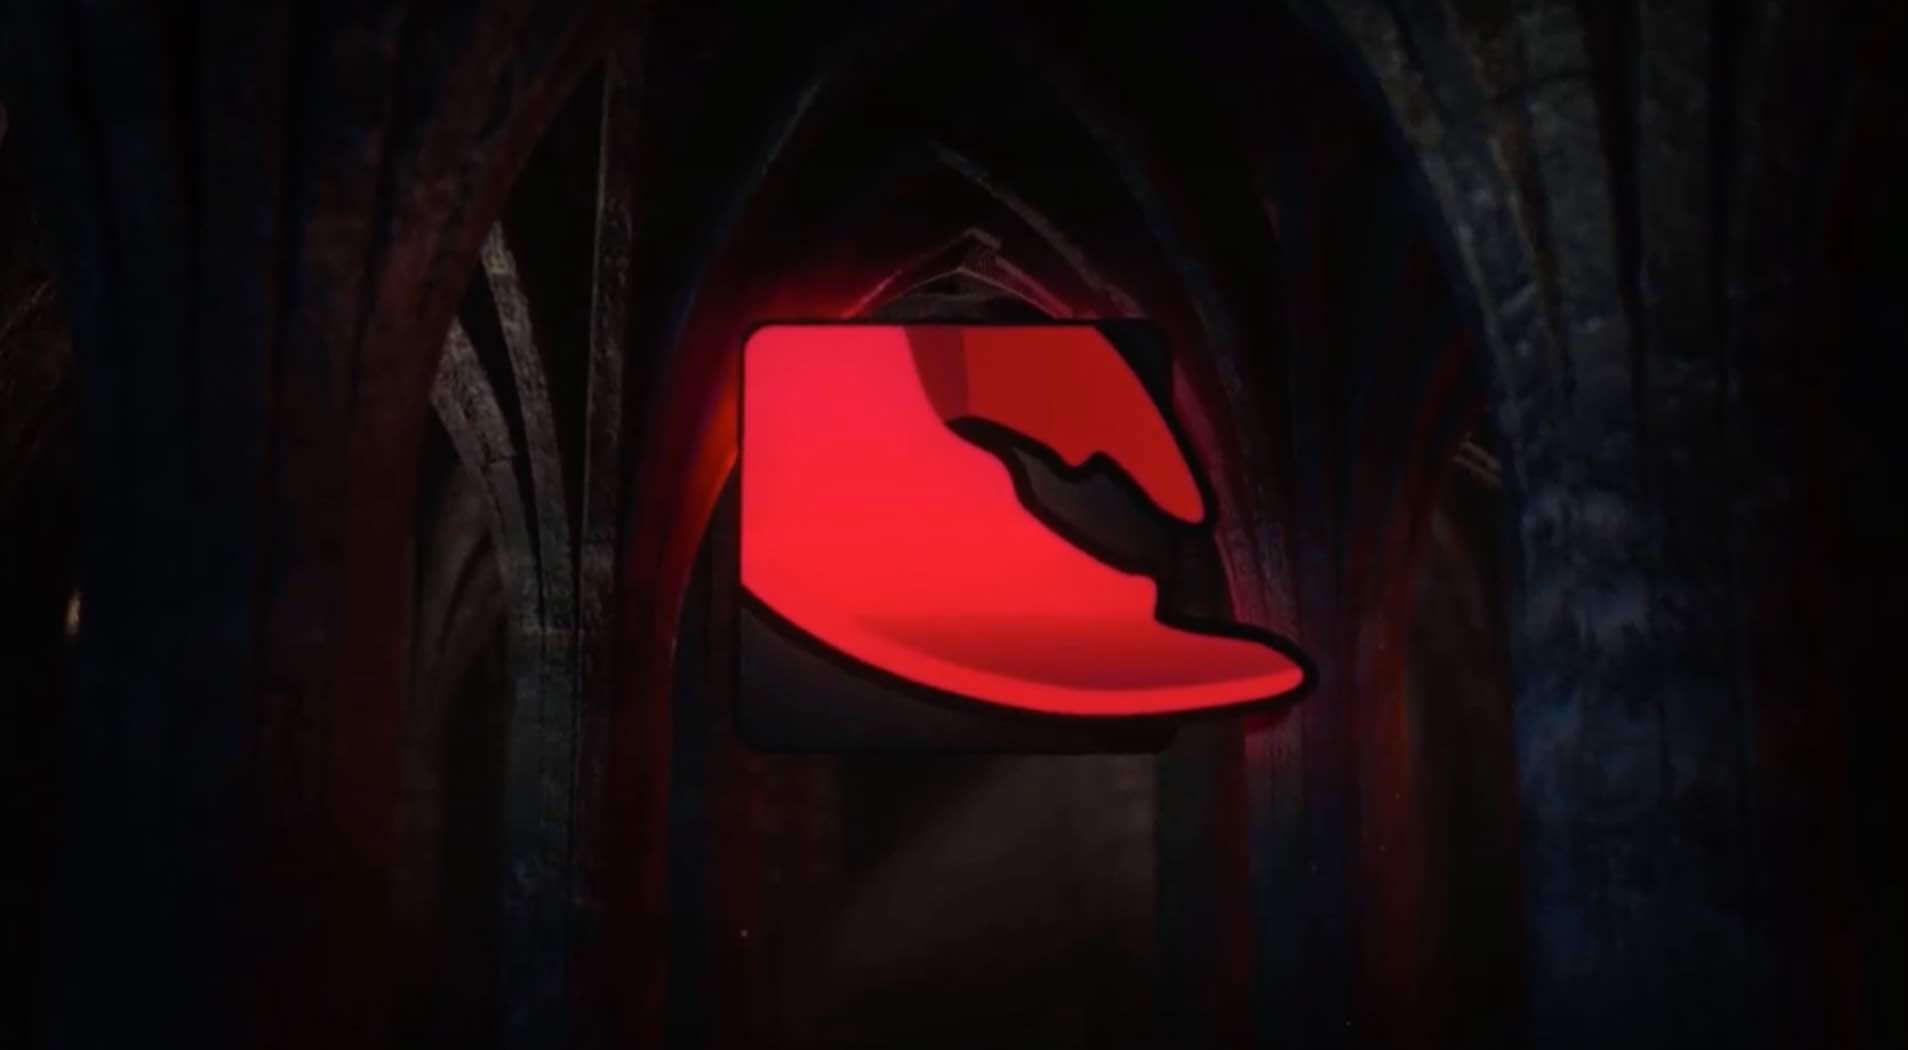 AE模板-大教堂阴暗风格图文展示插图